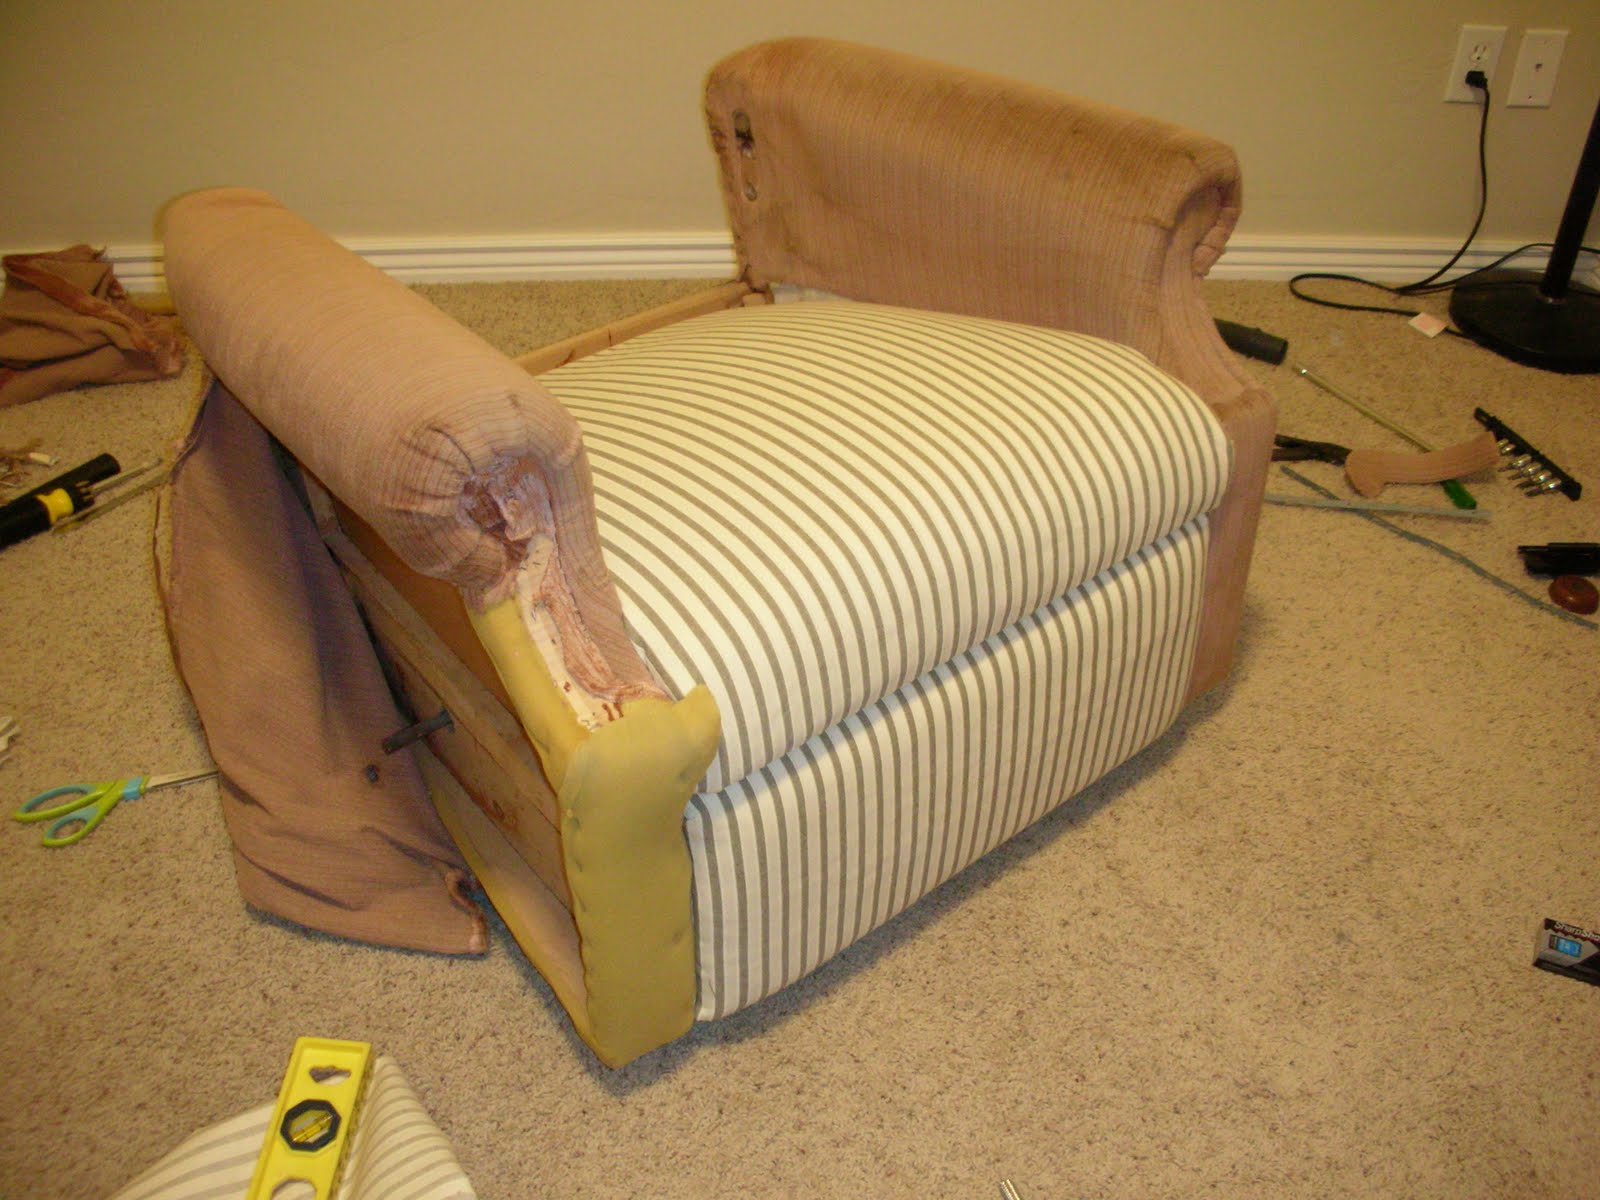 diy sofa reupholstering masoli cobblestone and loveseat do it yourself divas reupholster an old la z boy